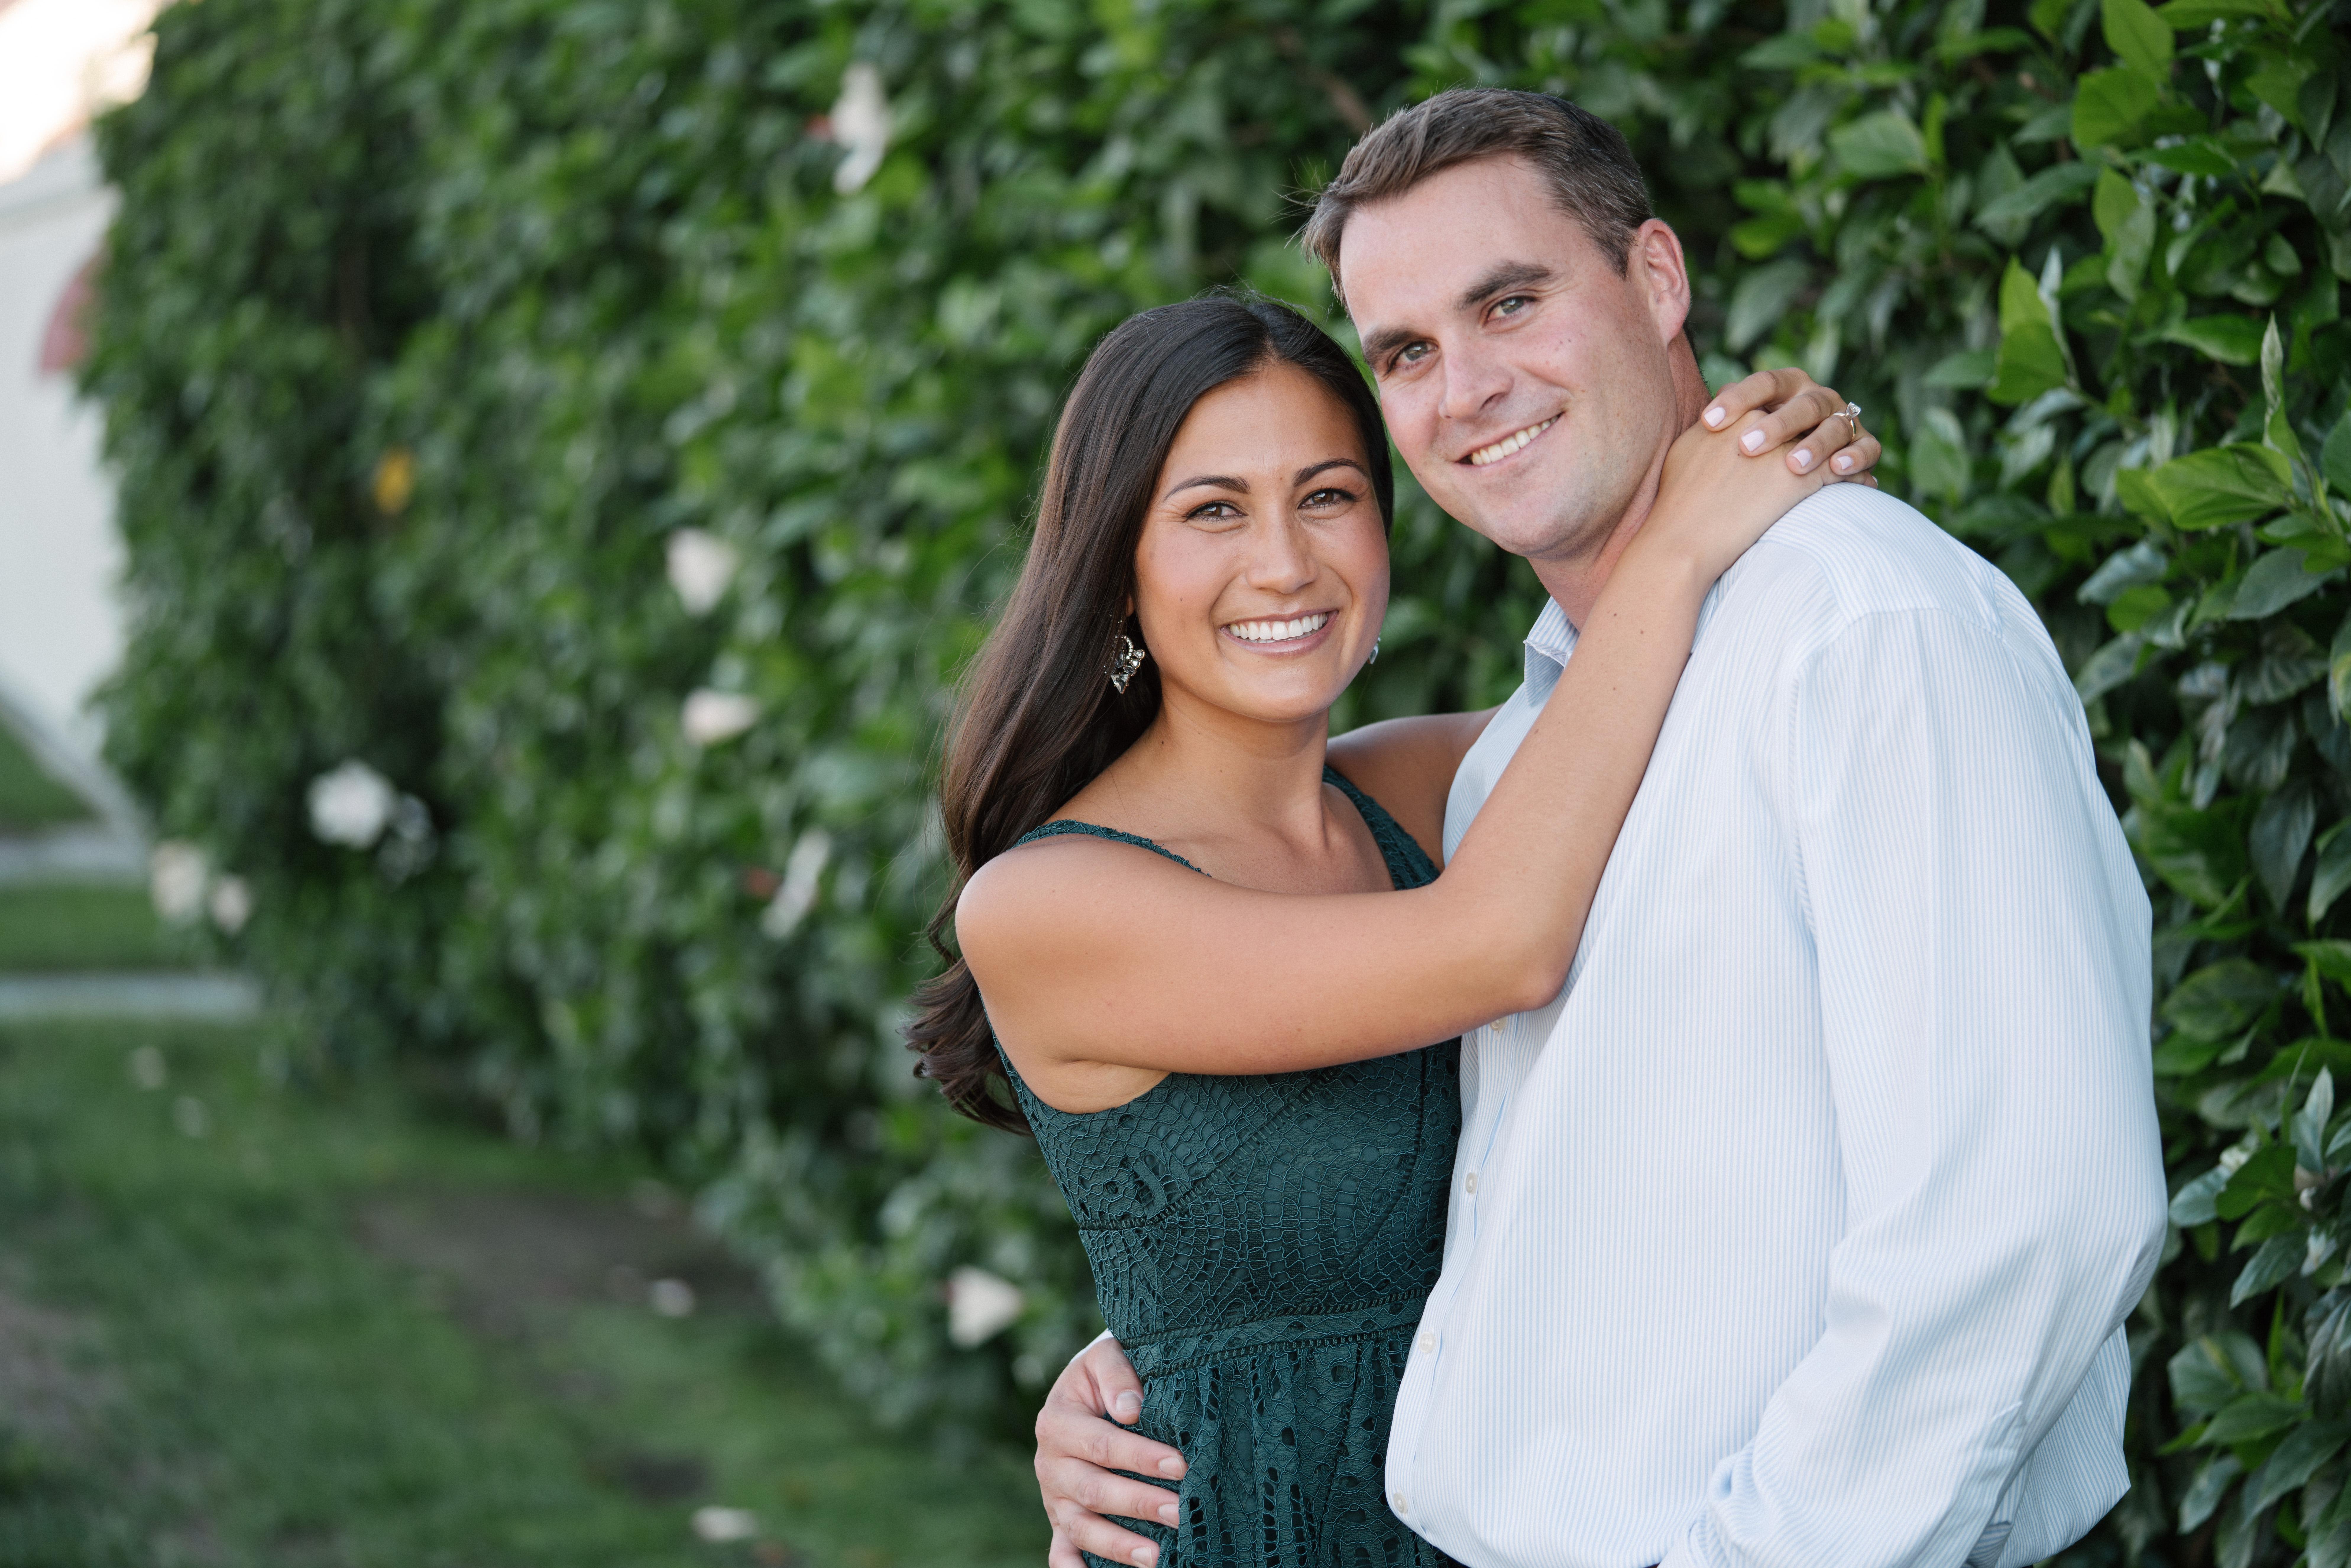 Olivia Teagan and Matthew David